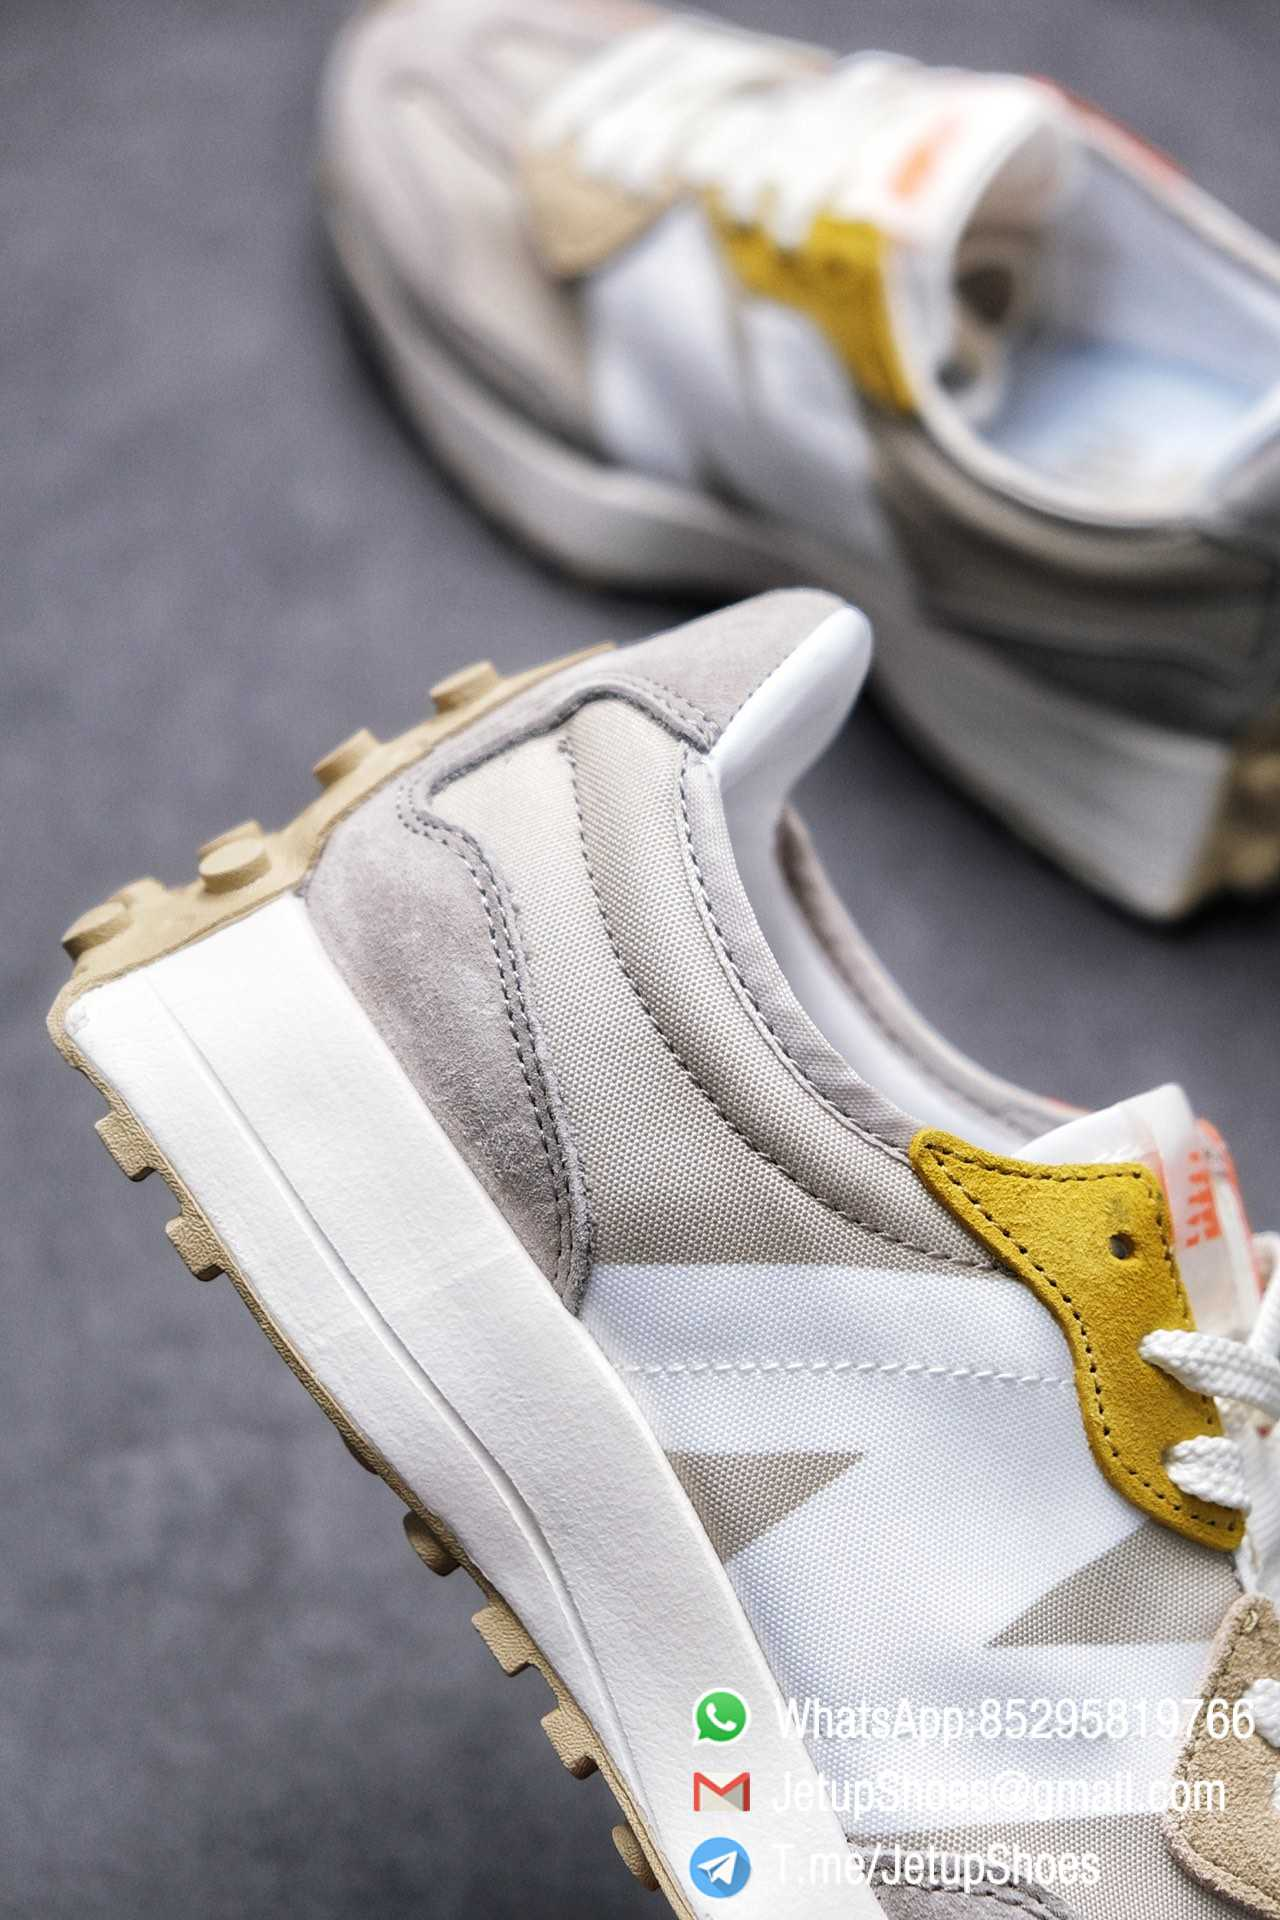 Best Replica New Balance Wmns 327 Light Grey Grey Khaki Upper SKU WS327MS RepSneakers Top Snkrs 06